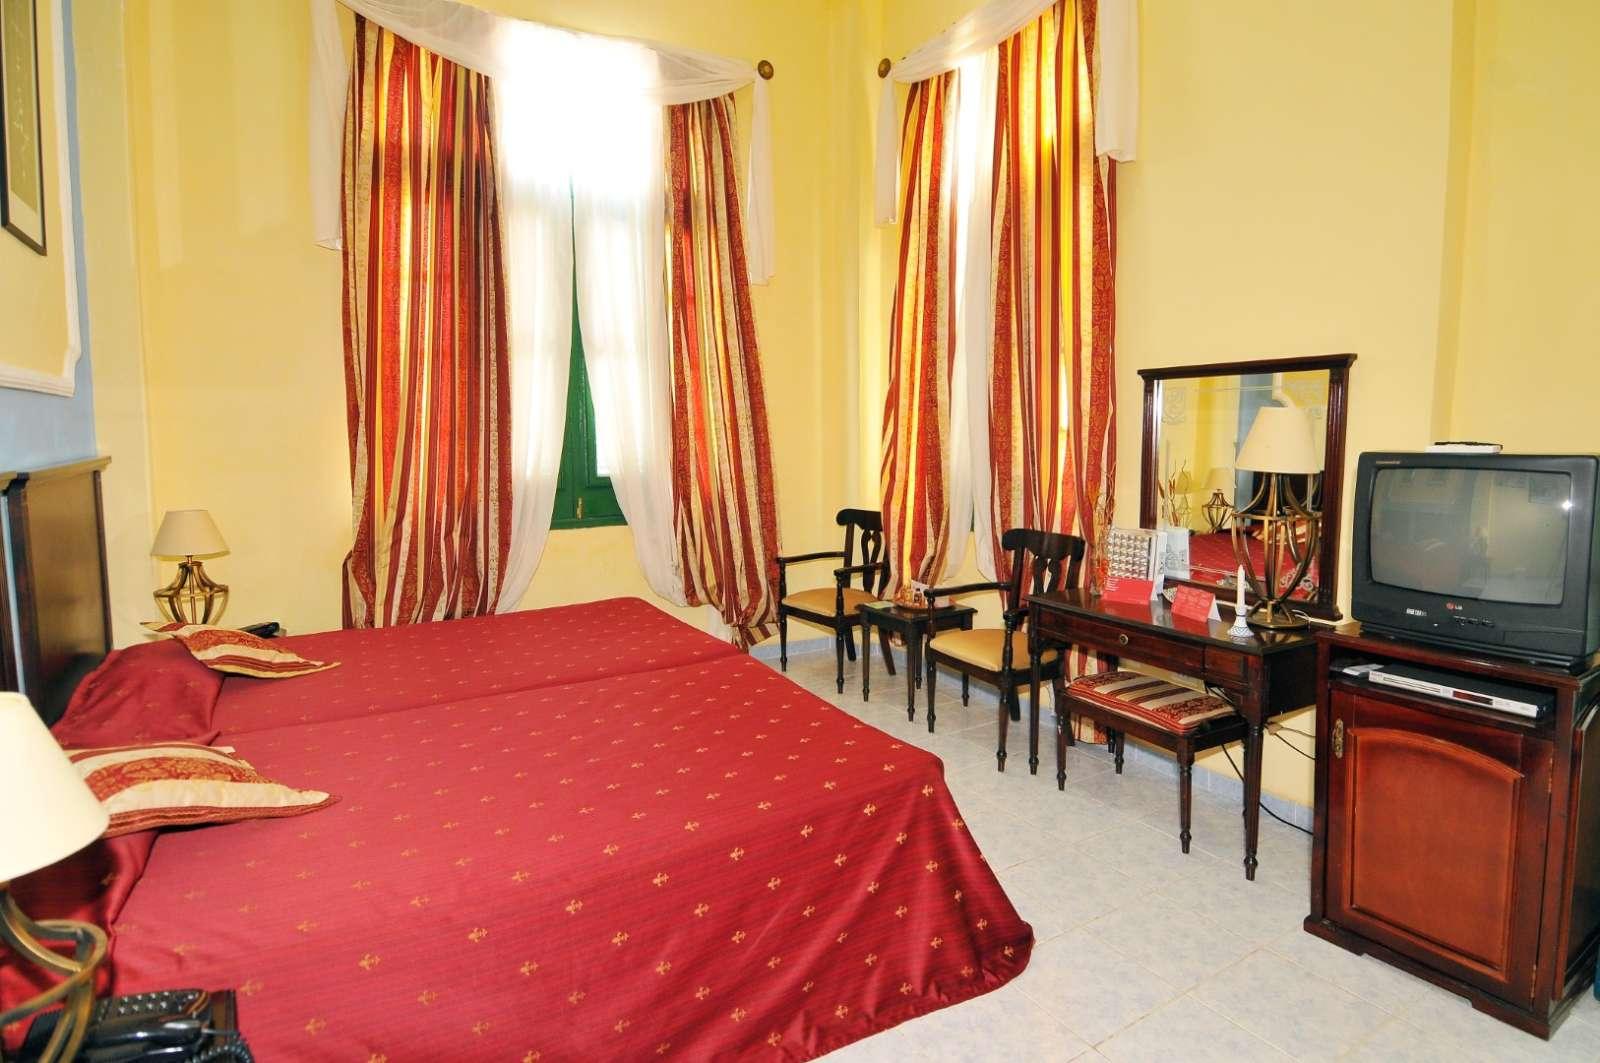 Twin room at Hostal San Basilio